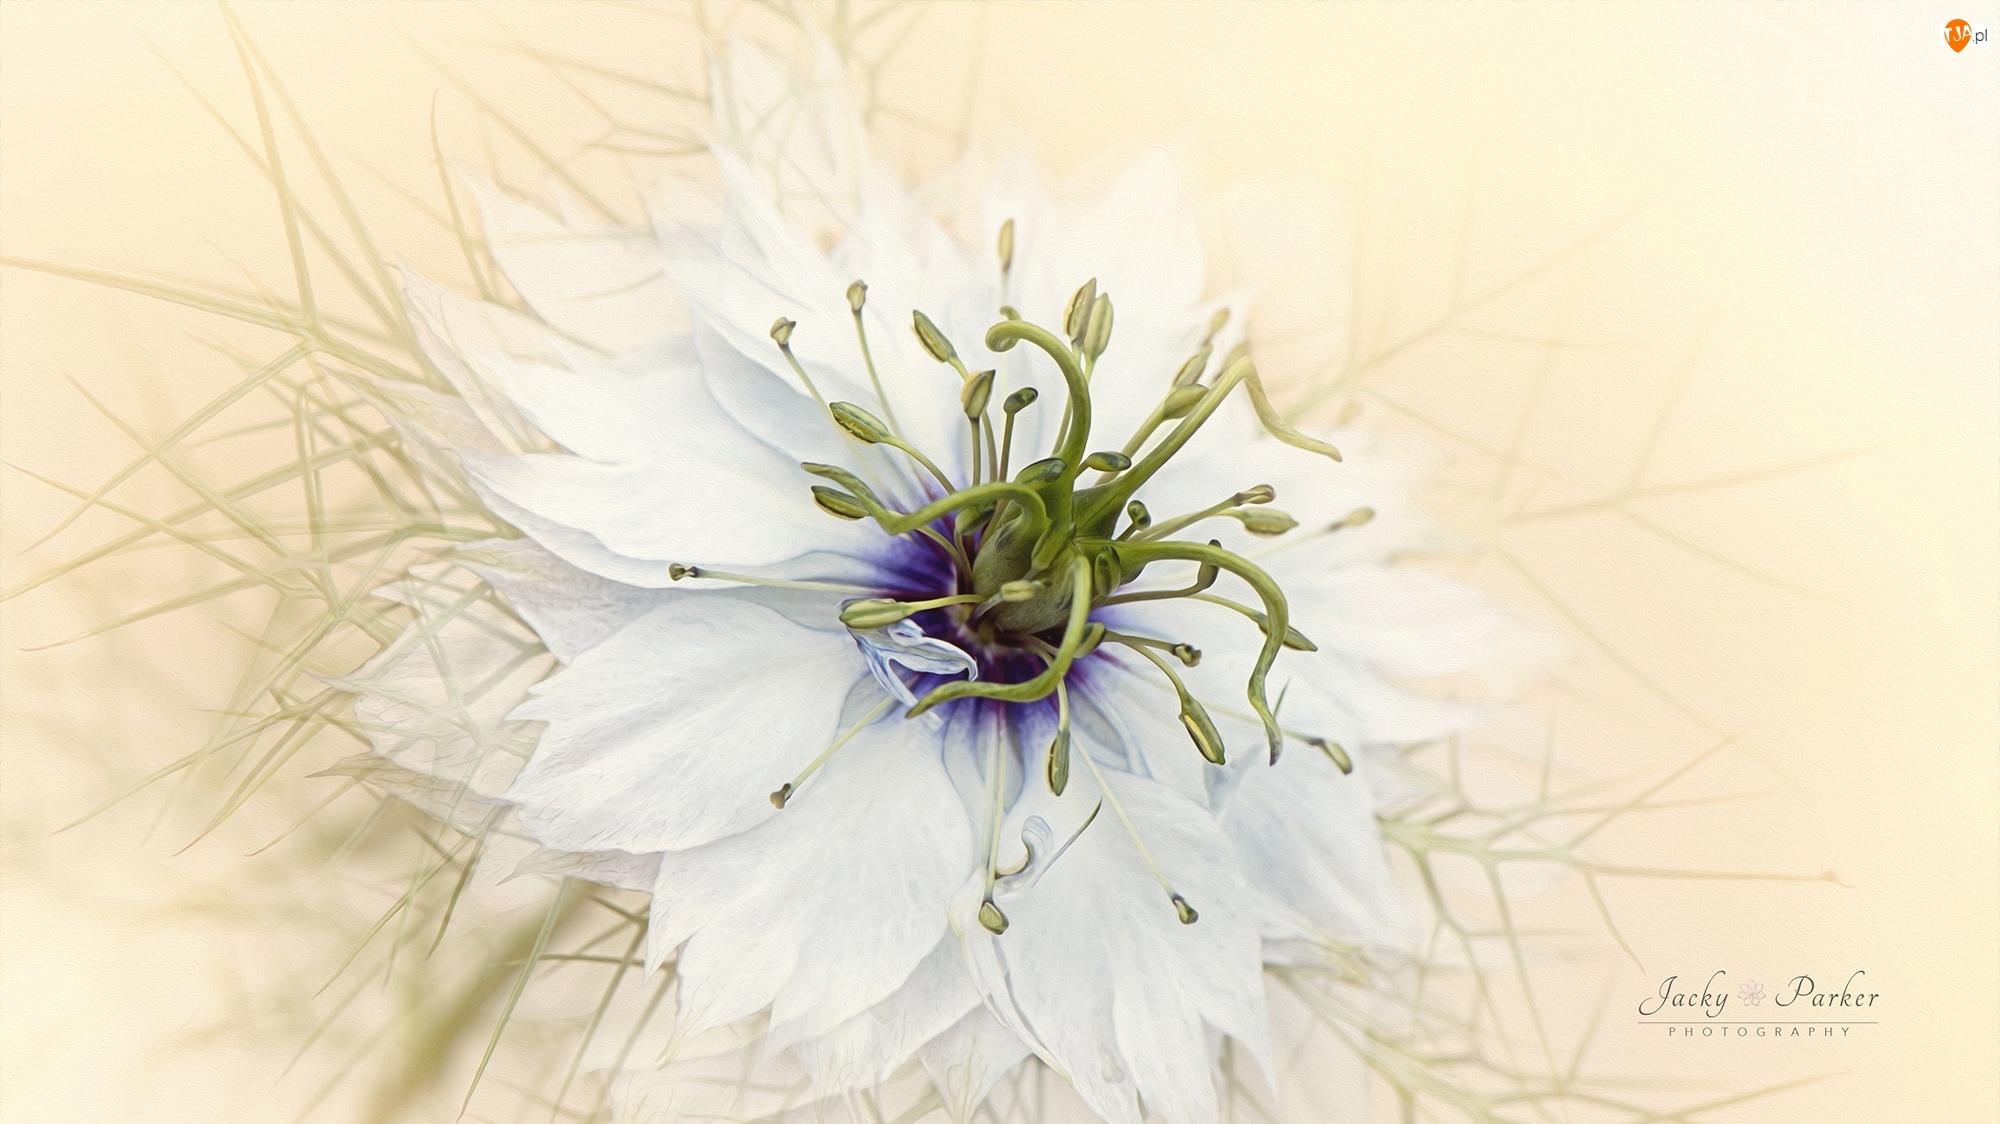 Makro, Kwiat, Czarnuszka damasceńska, Pręciki